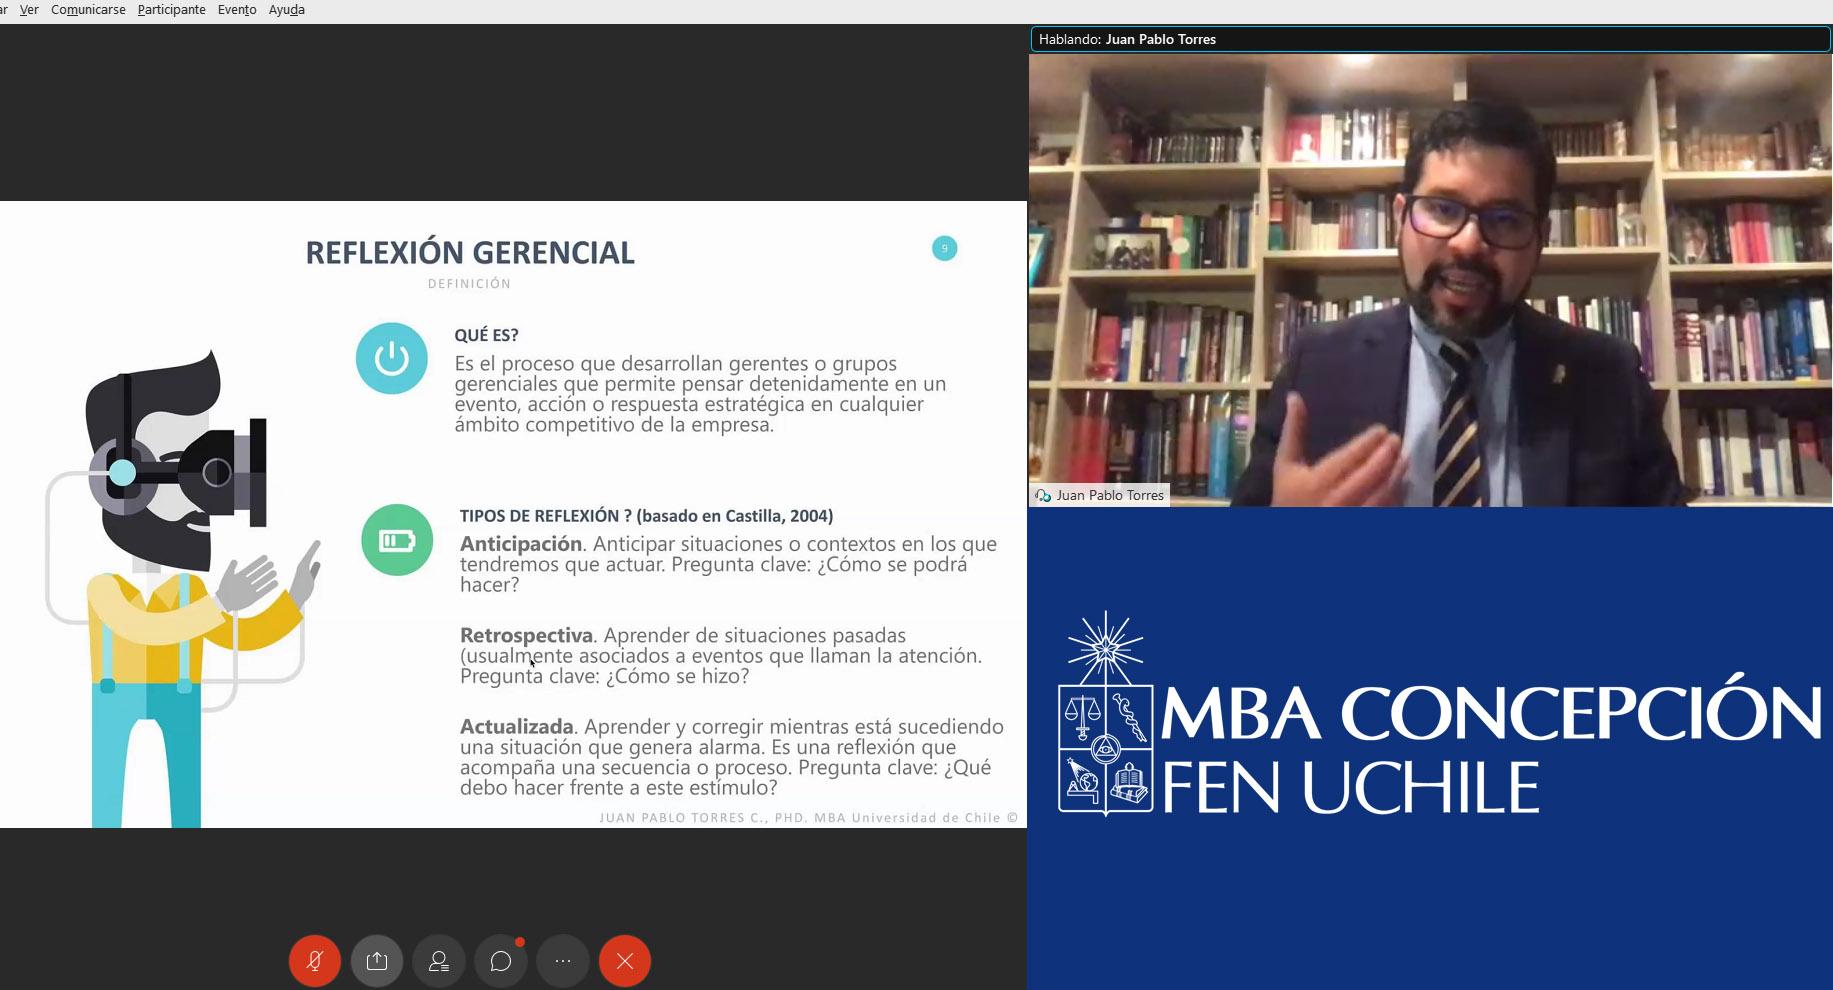 Profesor Juan Pablo Torres MBA FEN UCHILE Concepción